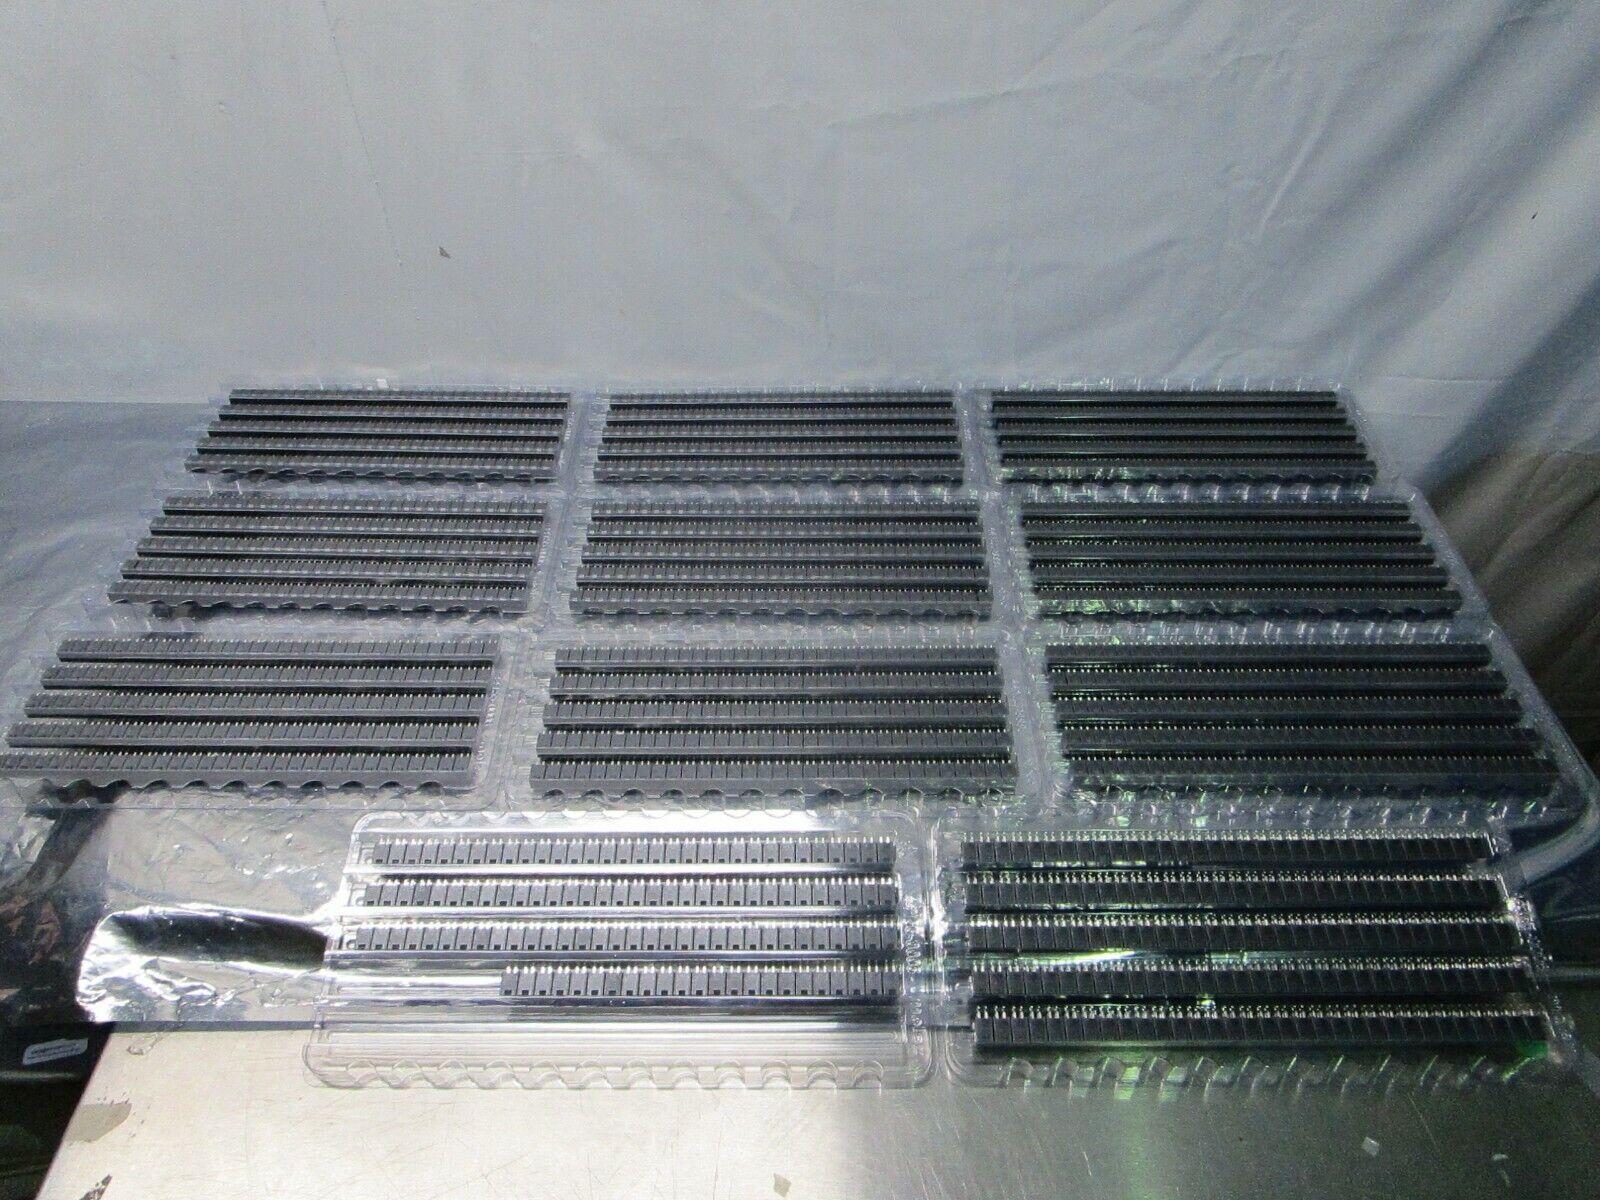 1 Lot of 1719 Molex 0462071004 Mini-Fit Jr LCP Vert. Hdr NoPeg 4ckt Tin, 101987